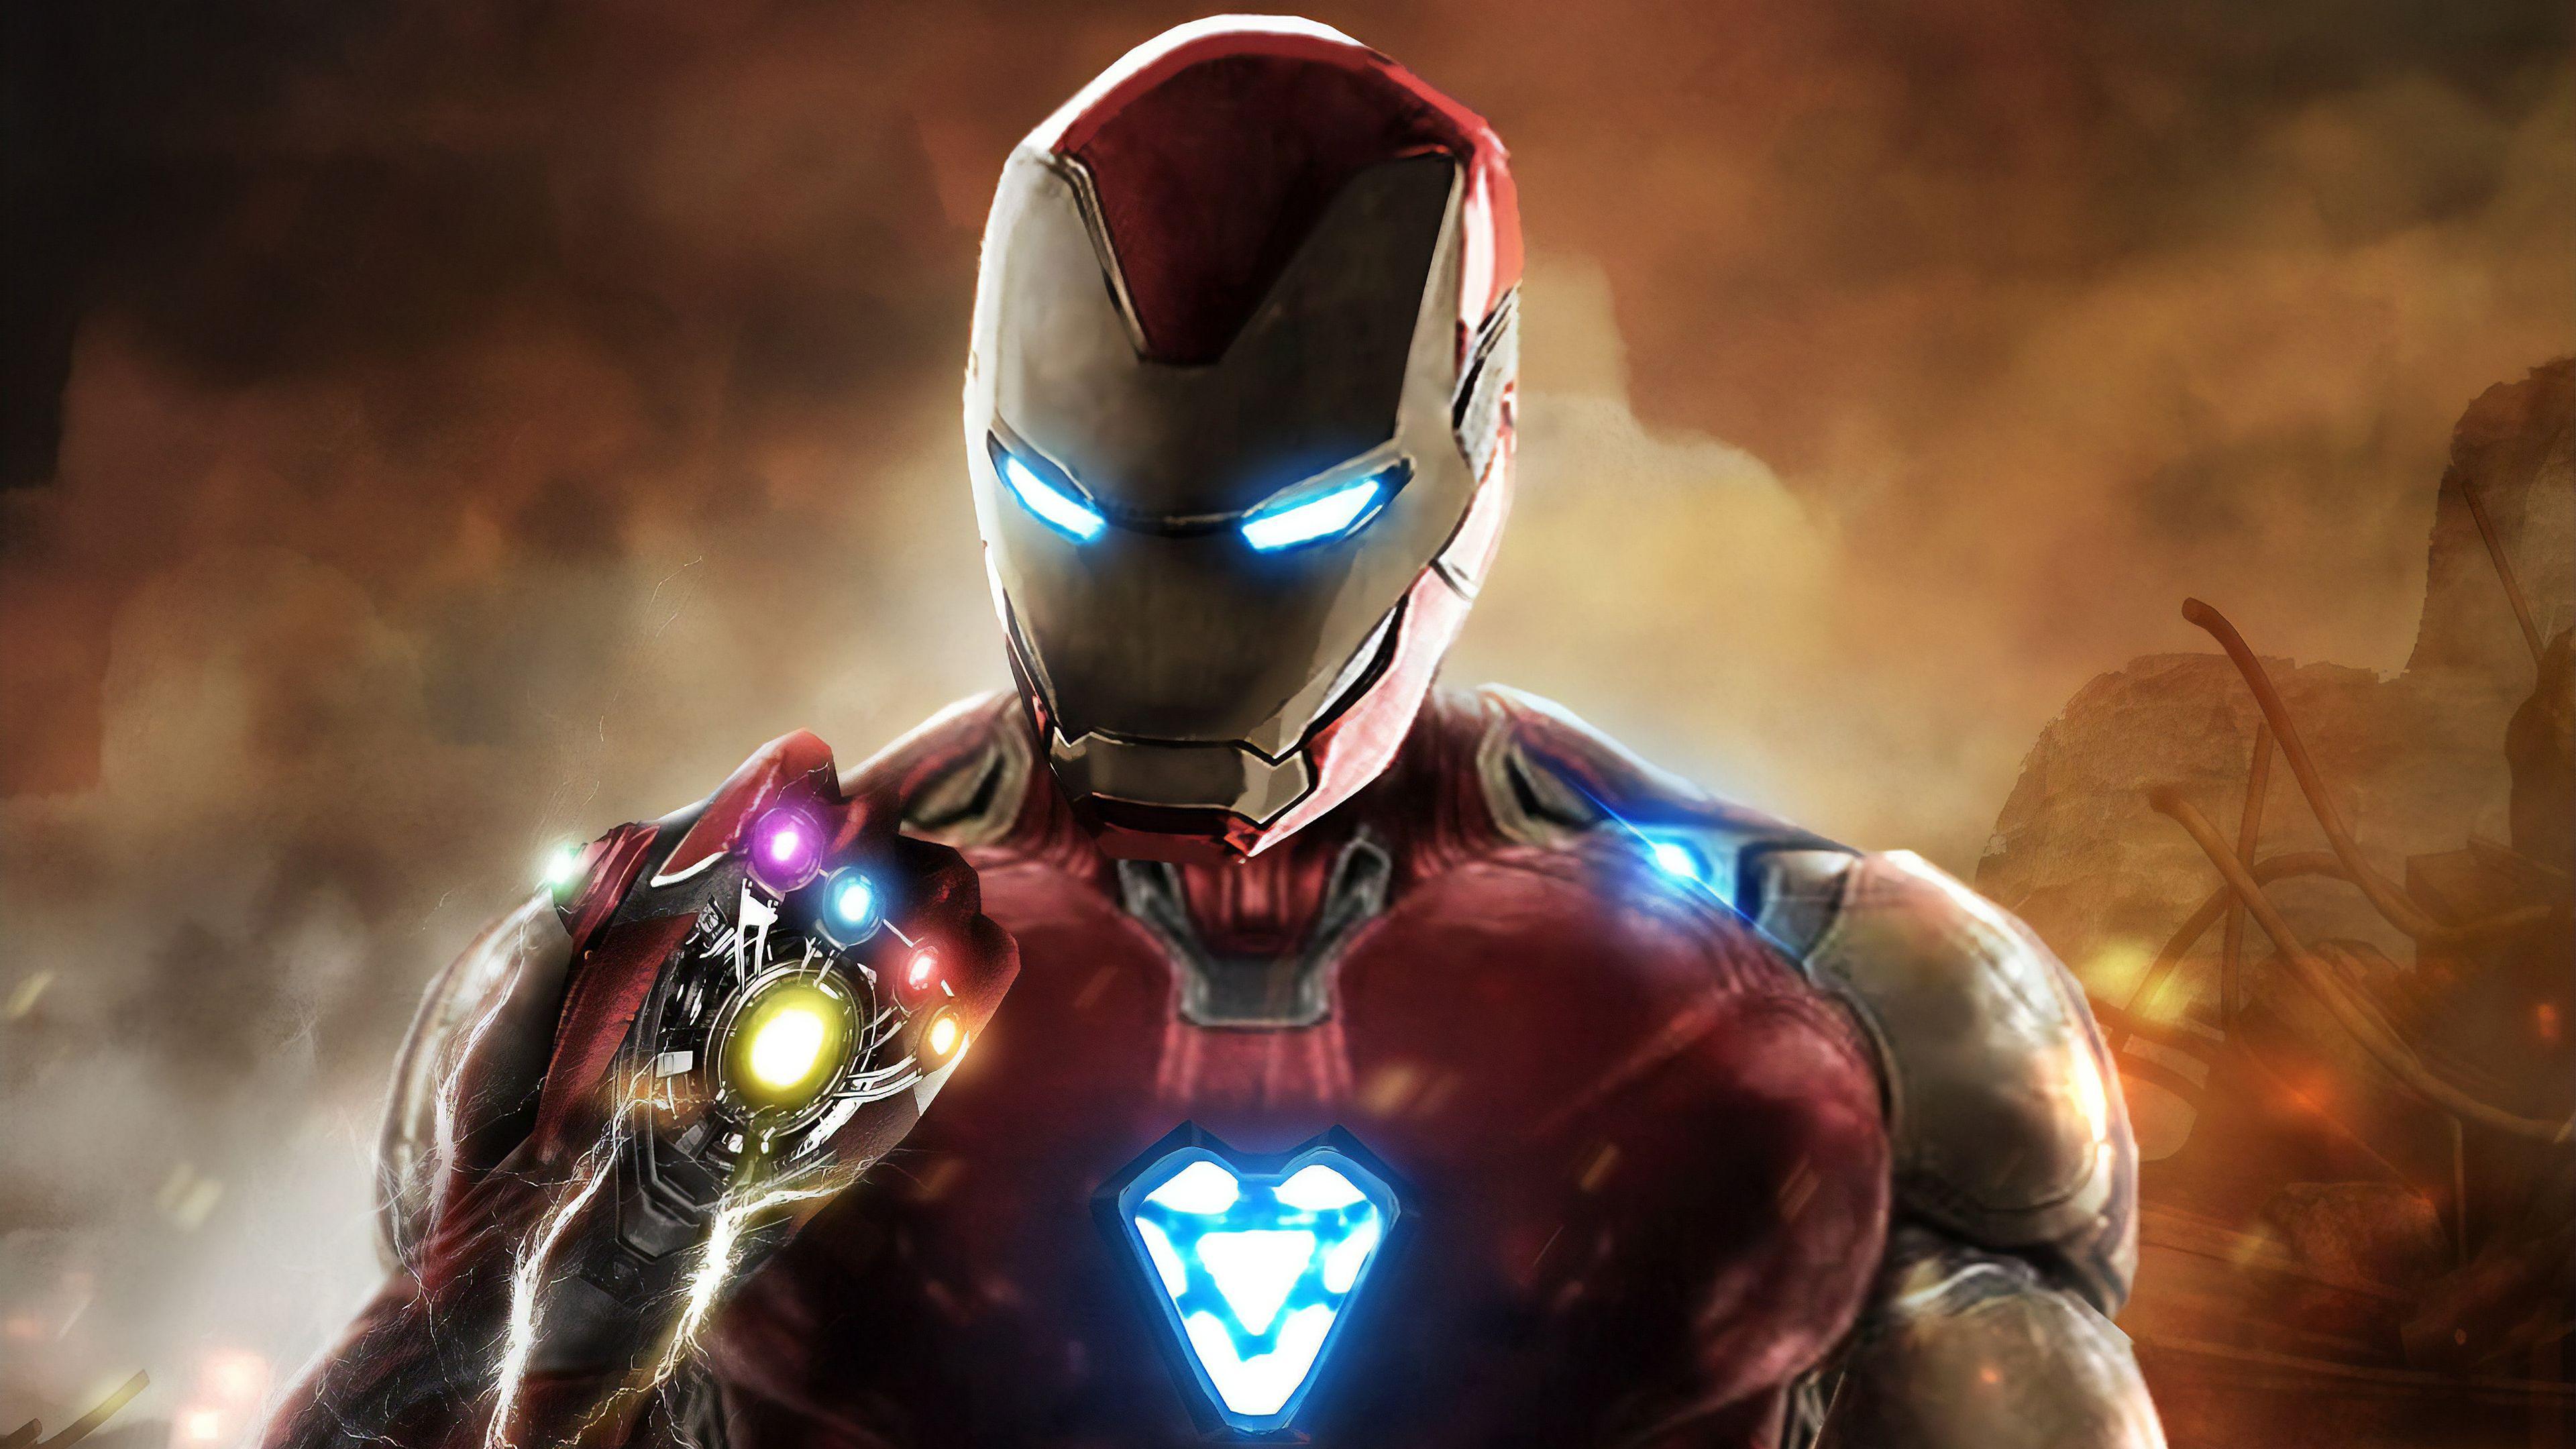 Iron Man Infinity Gauntlet Avengers Endgame Superheroes Wallpapers Iron Man Wallpapers Hd Wal Avengers Endgame Wallpaper Iron Man Avengers Endgame Wallpapers